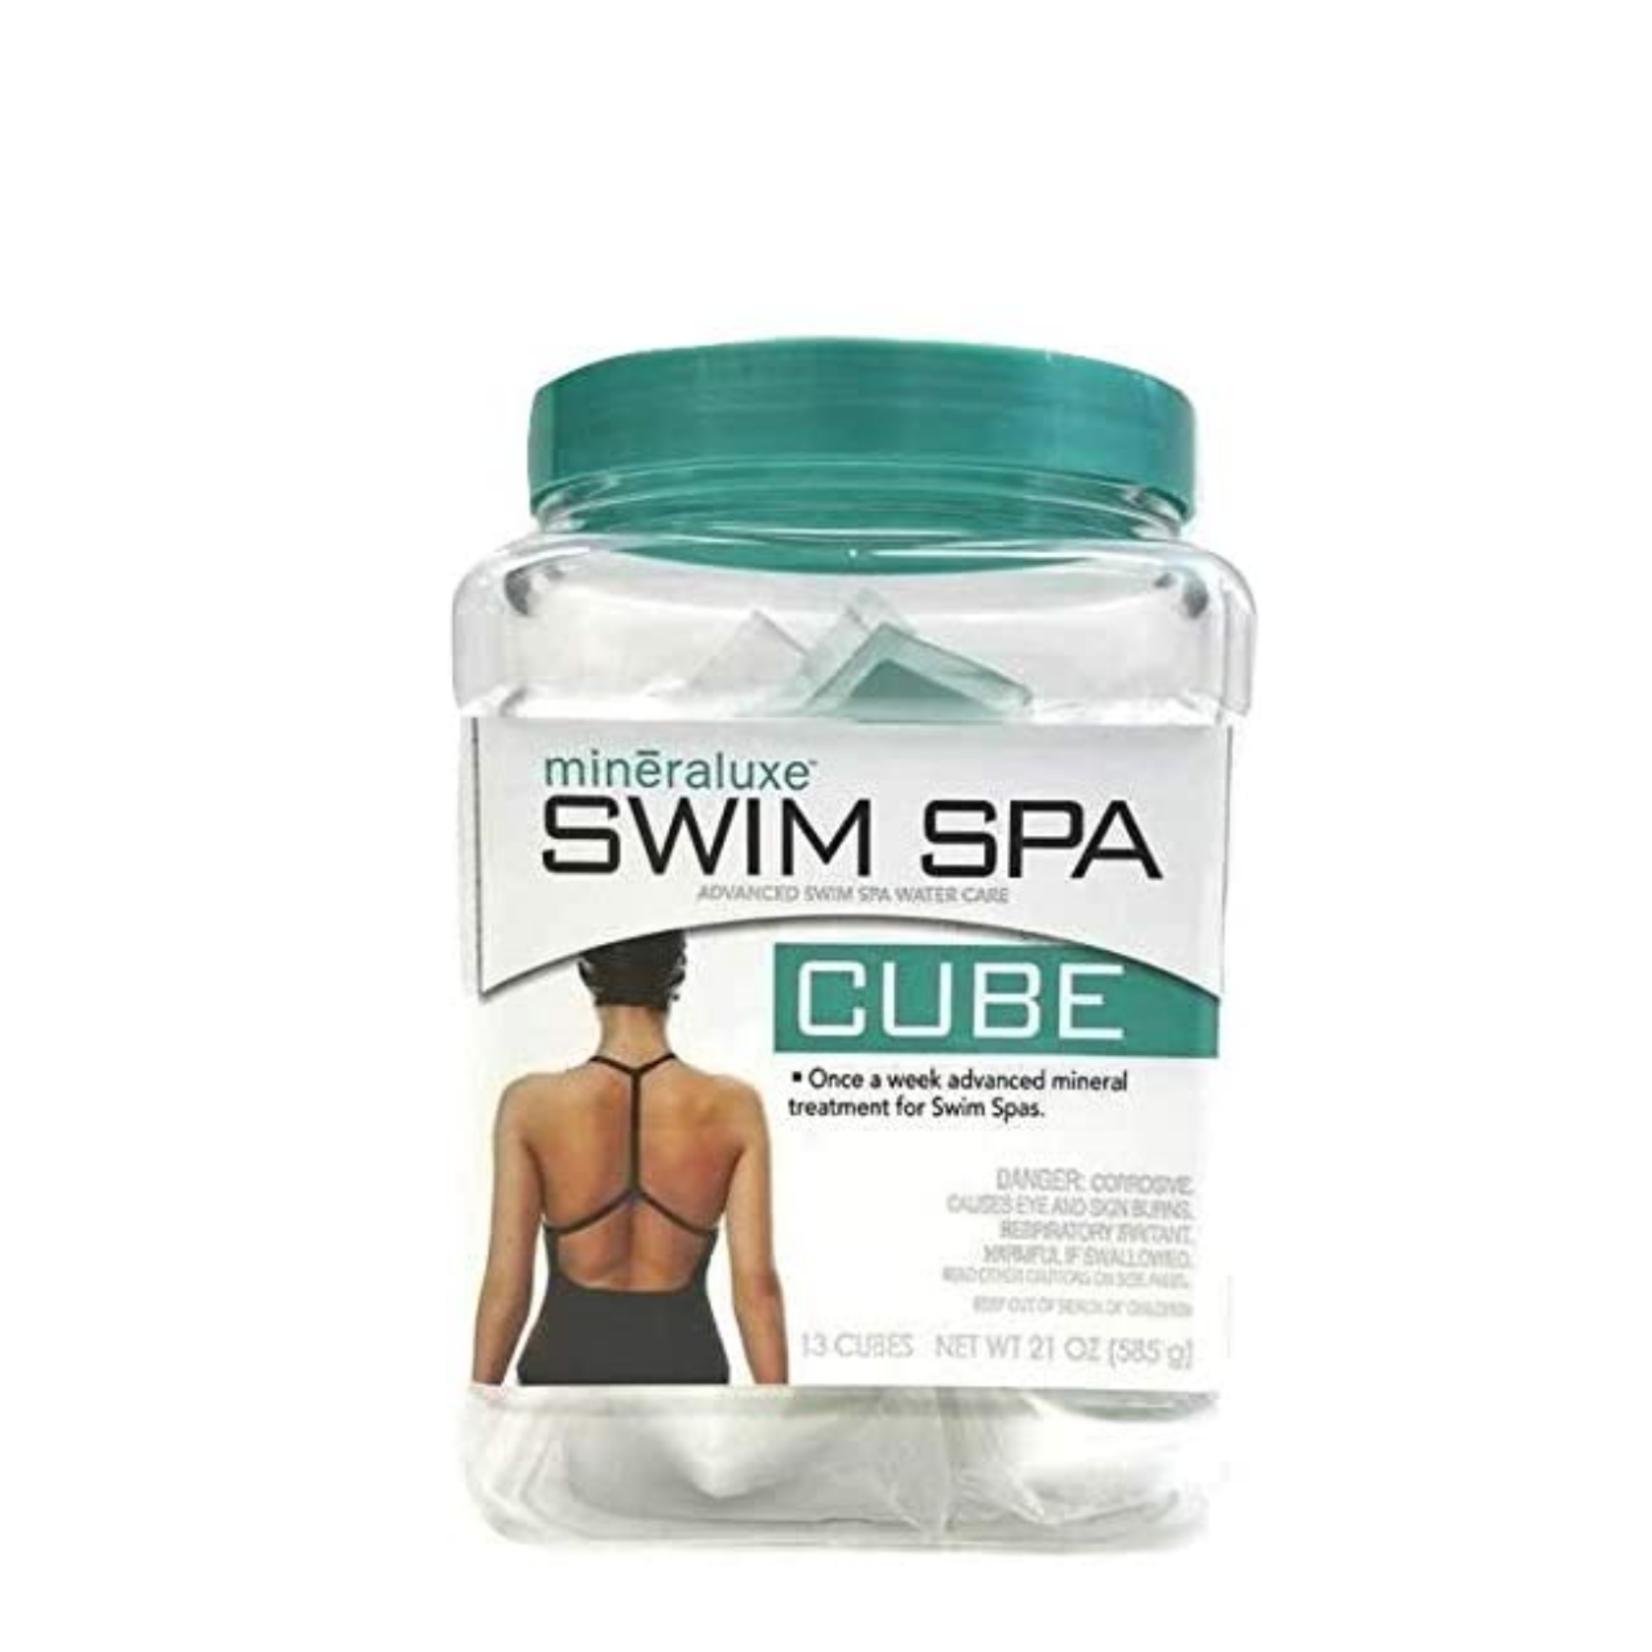 Mineraluxe Swim Spa Cube (13 cubes)